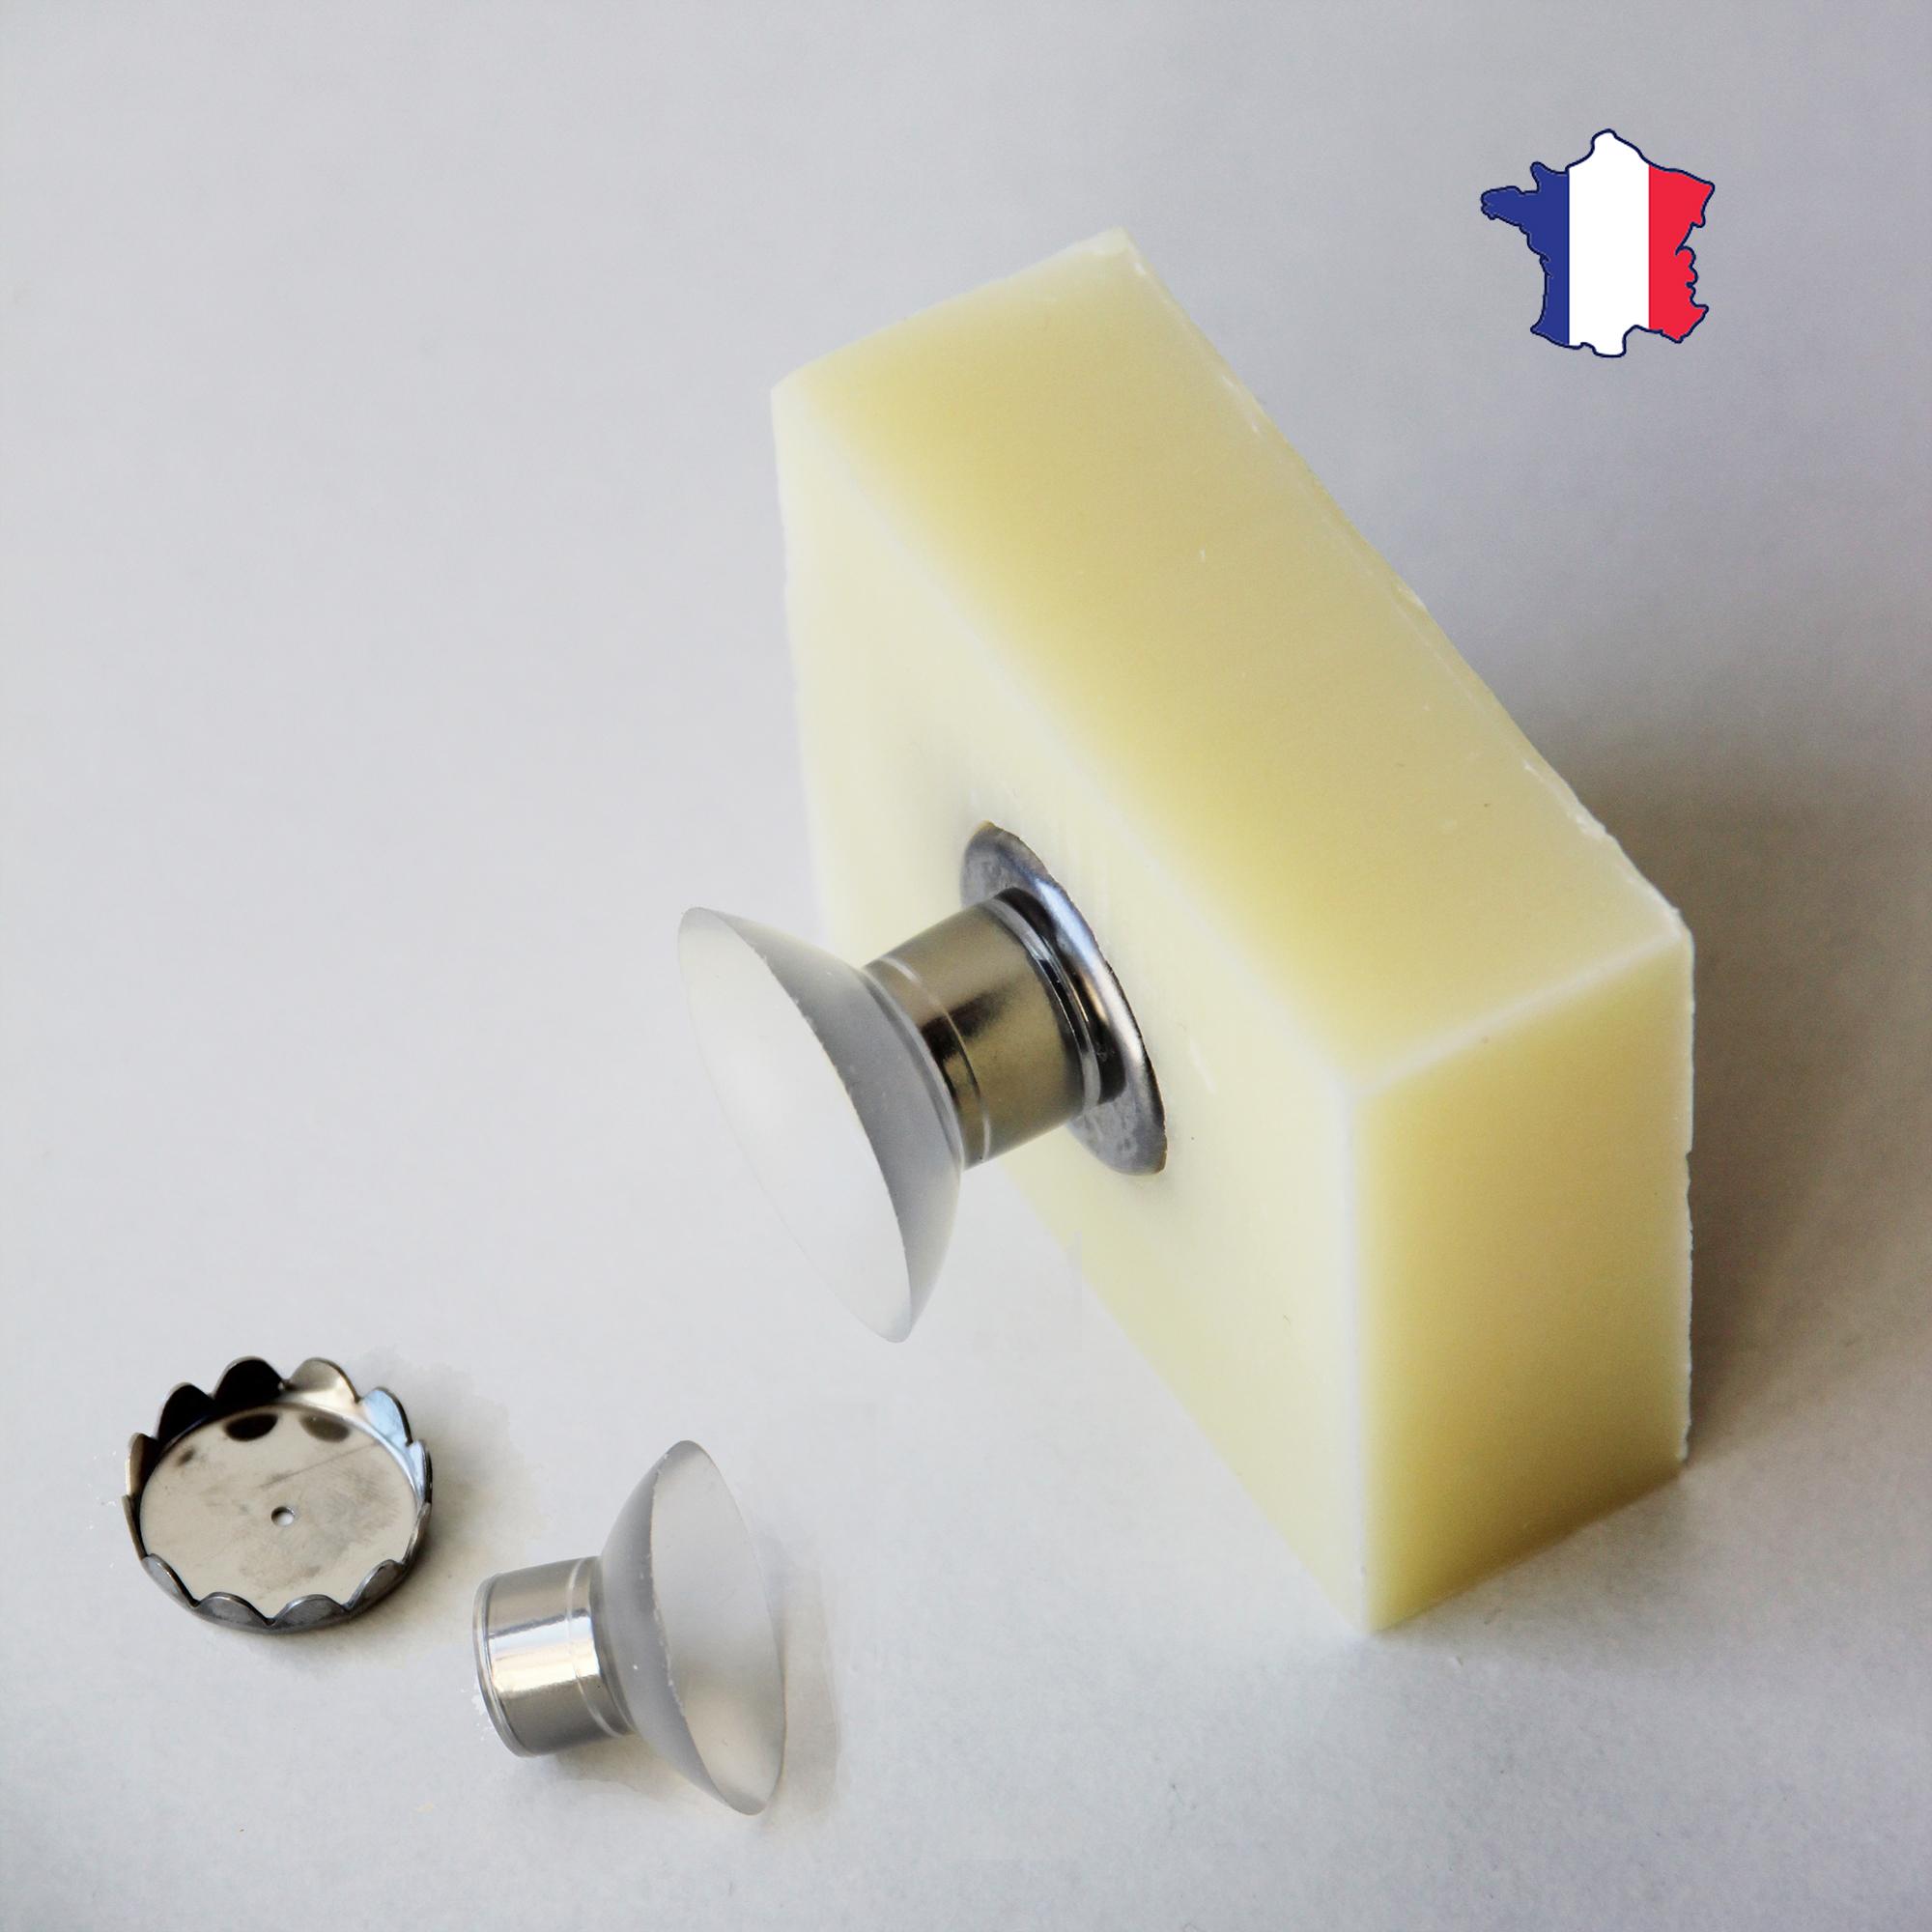 Porte savon minimaliste aimanté